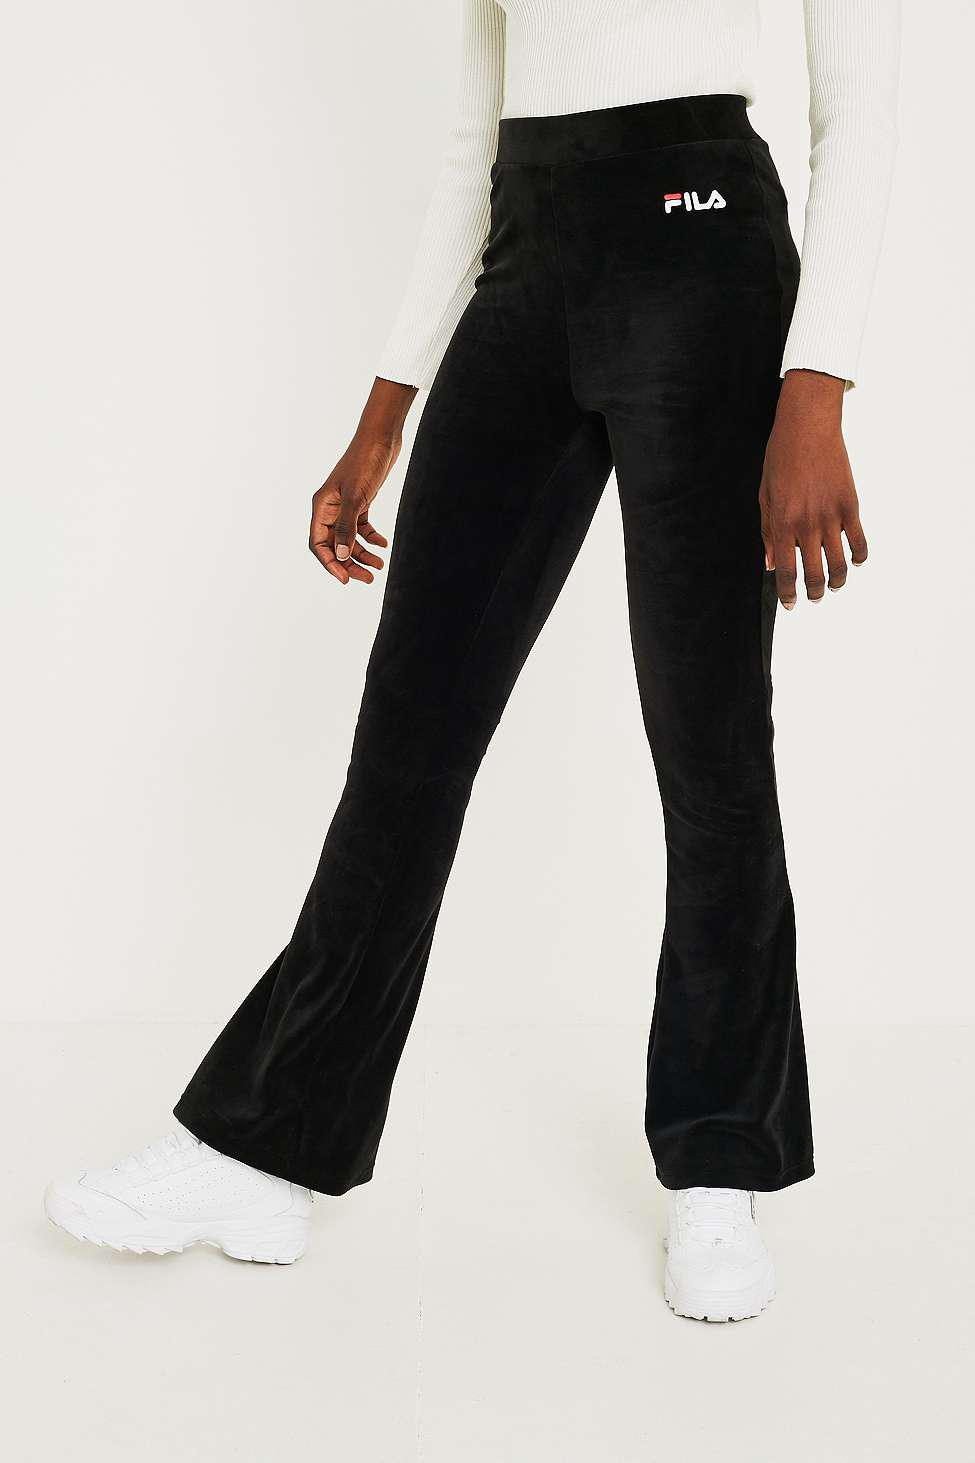 eaeaa77659ec Fila Tonia Velour Flare Track Pants - Womens L in Black - Lyst